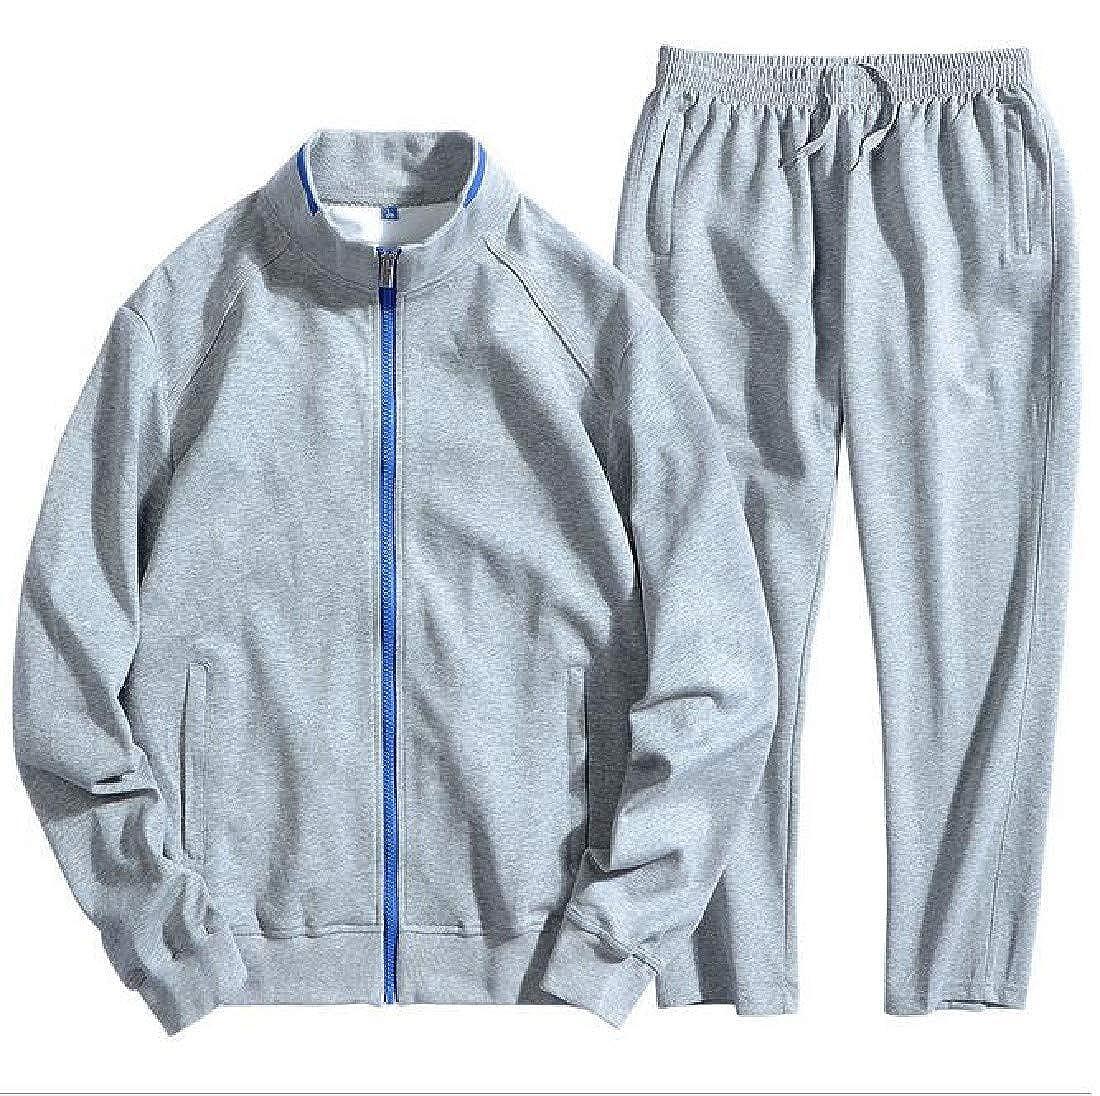 Pandapang Mens Zipper Jacket Sports Big and Tall Sweatpants Tracksuit Set